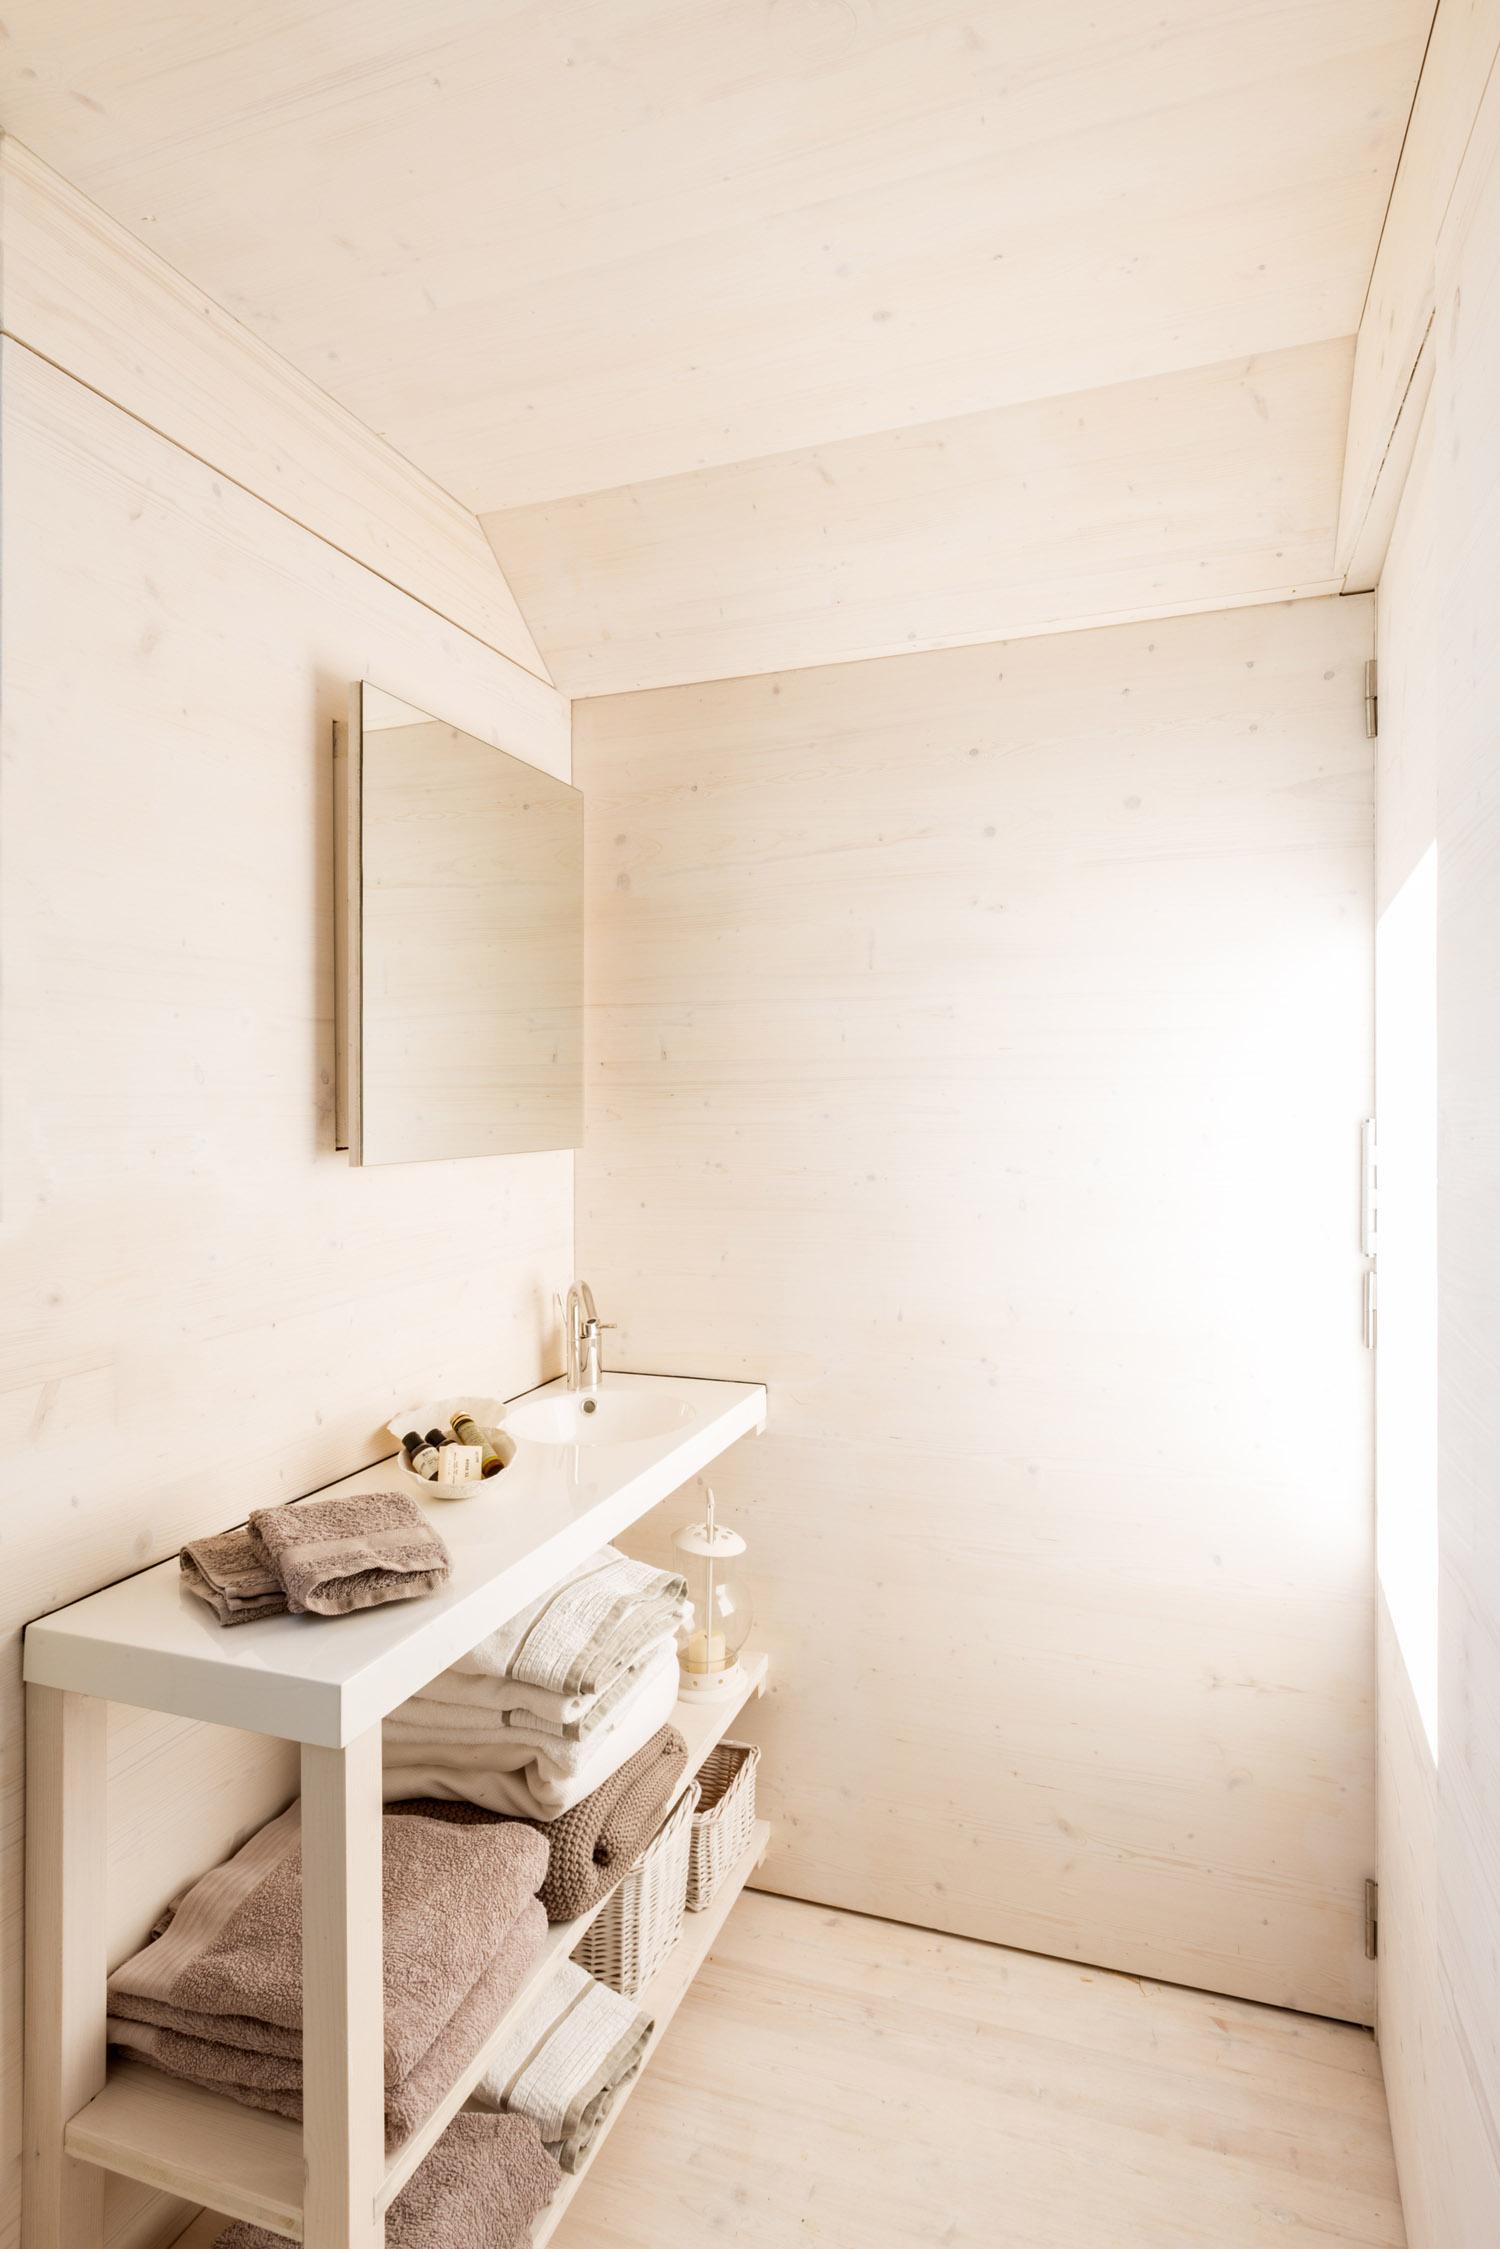 Portable home by architecture studio ÁBATON 17